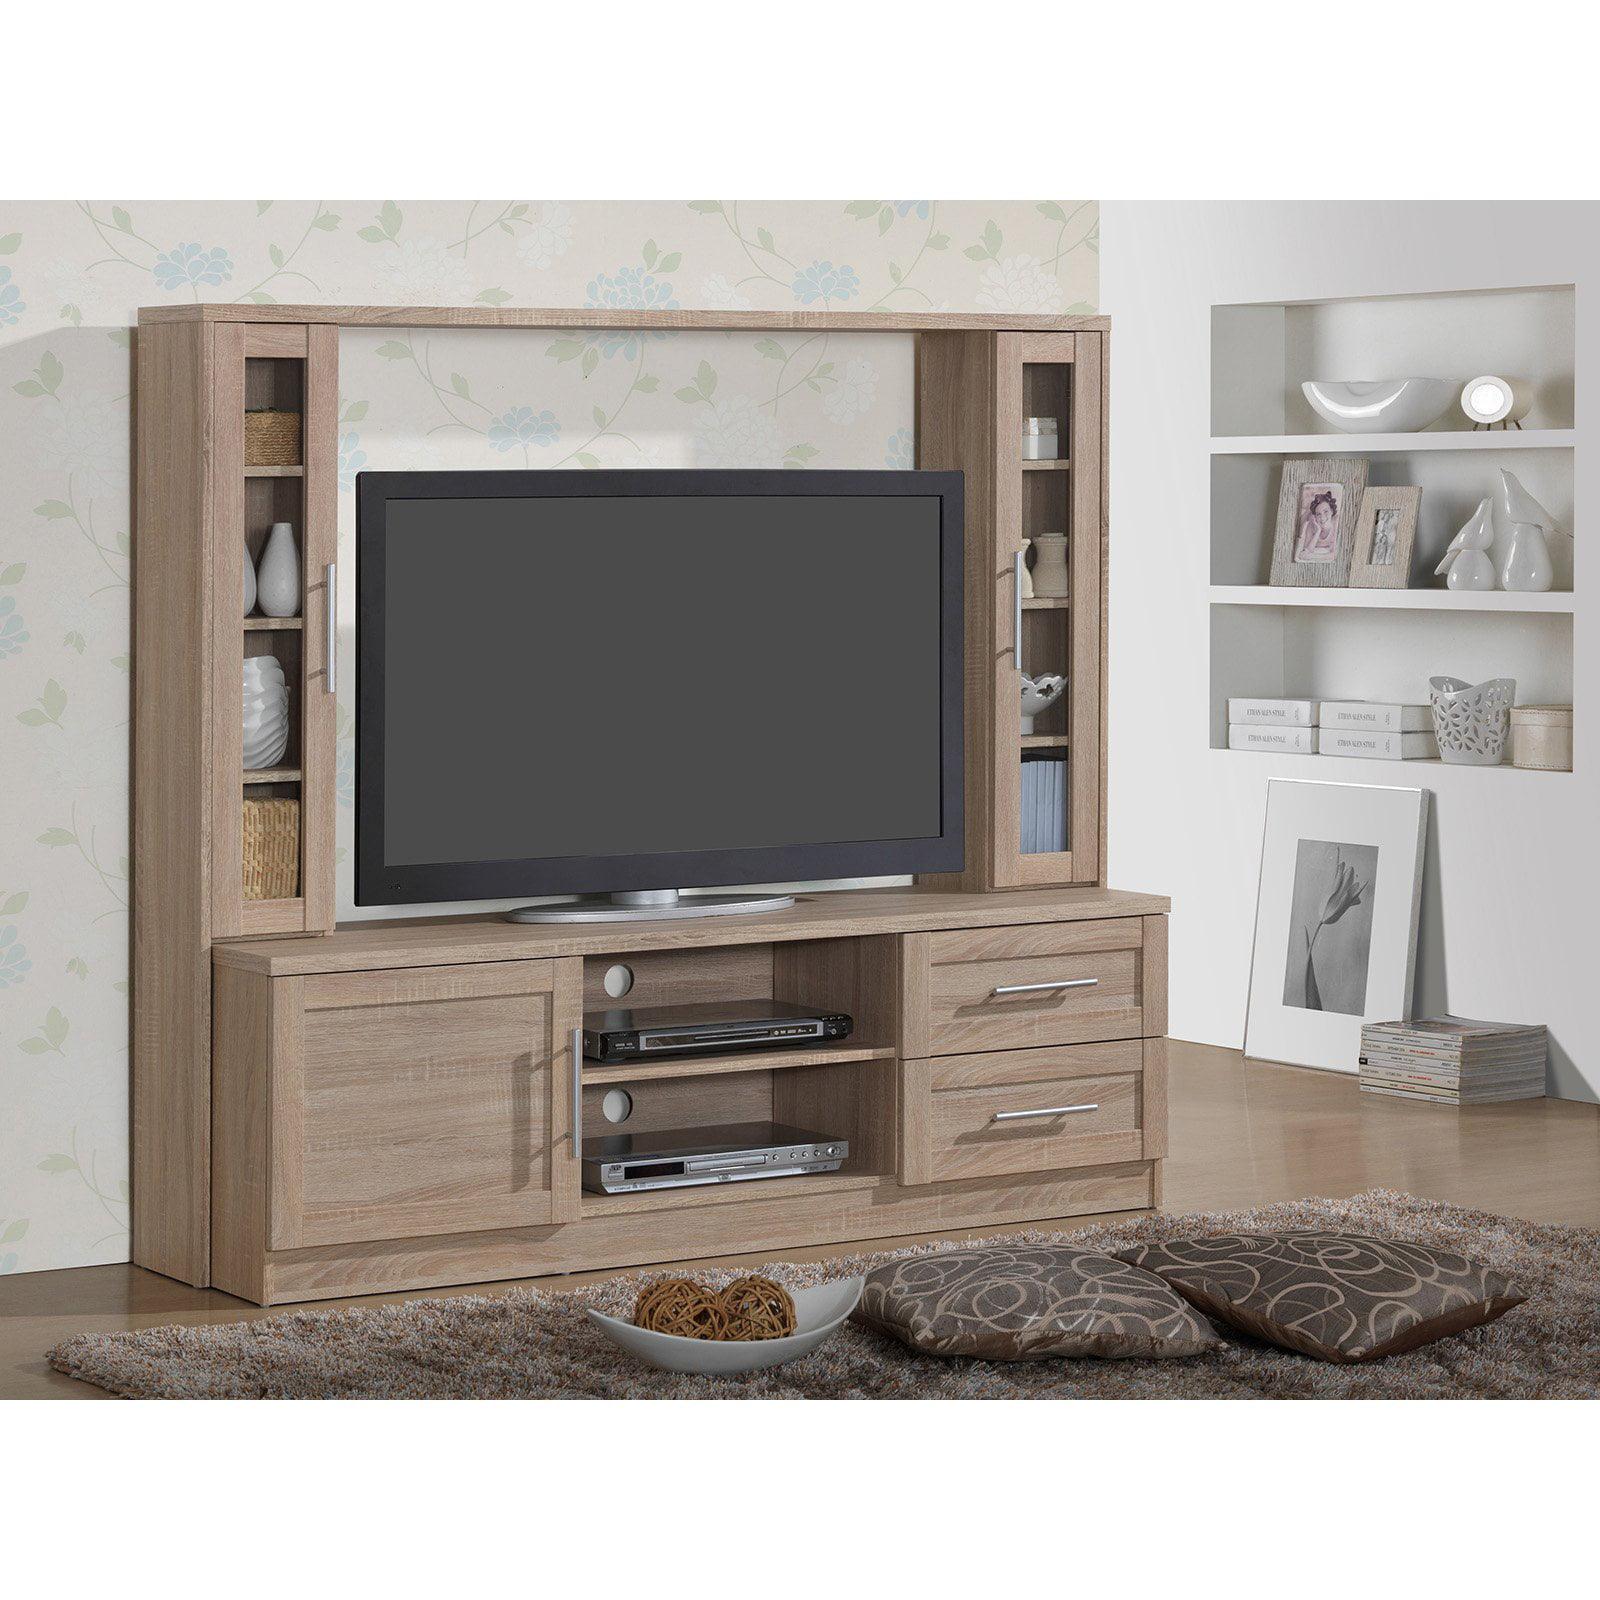 Techni Mobili Vegas Sand Home Entertainment Center for TVs up to 55\ by Techni Mobili